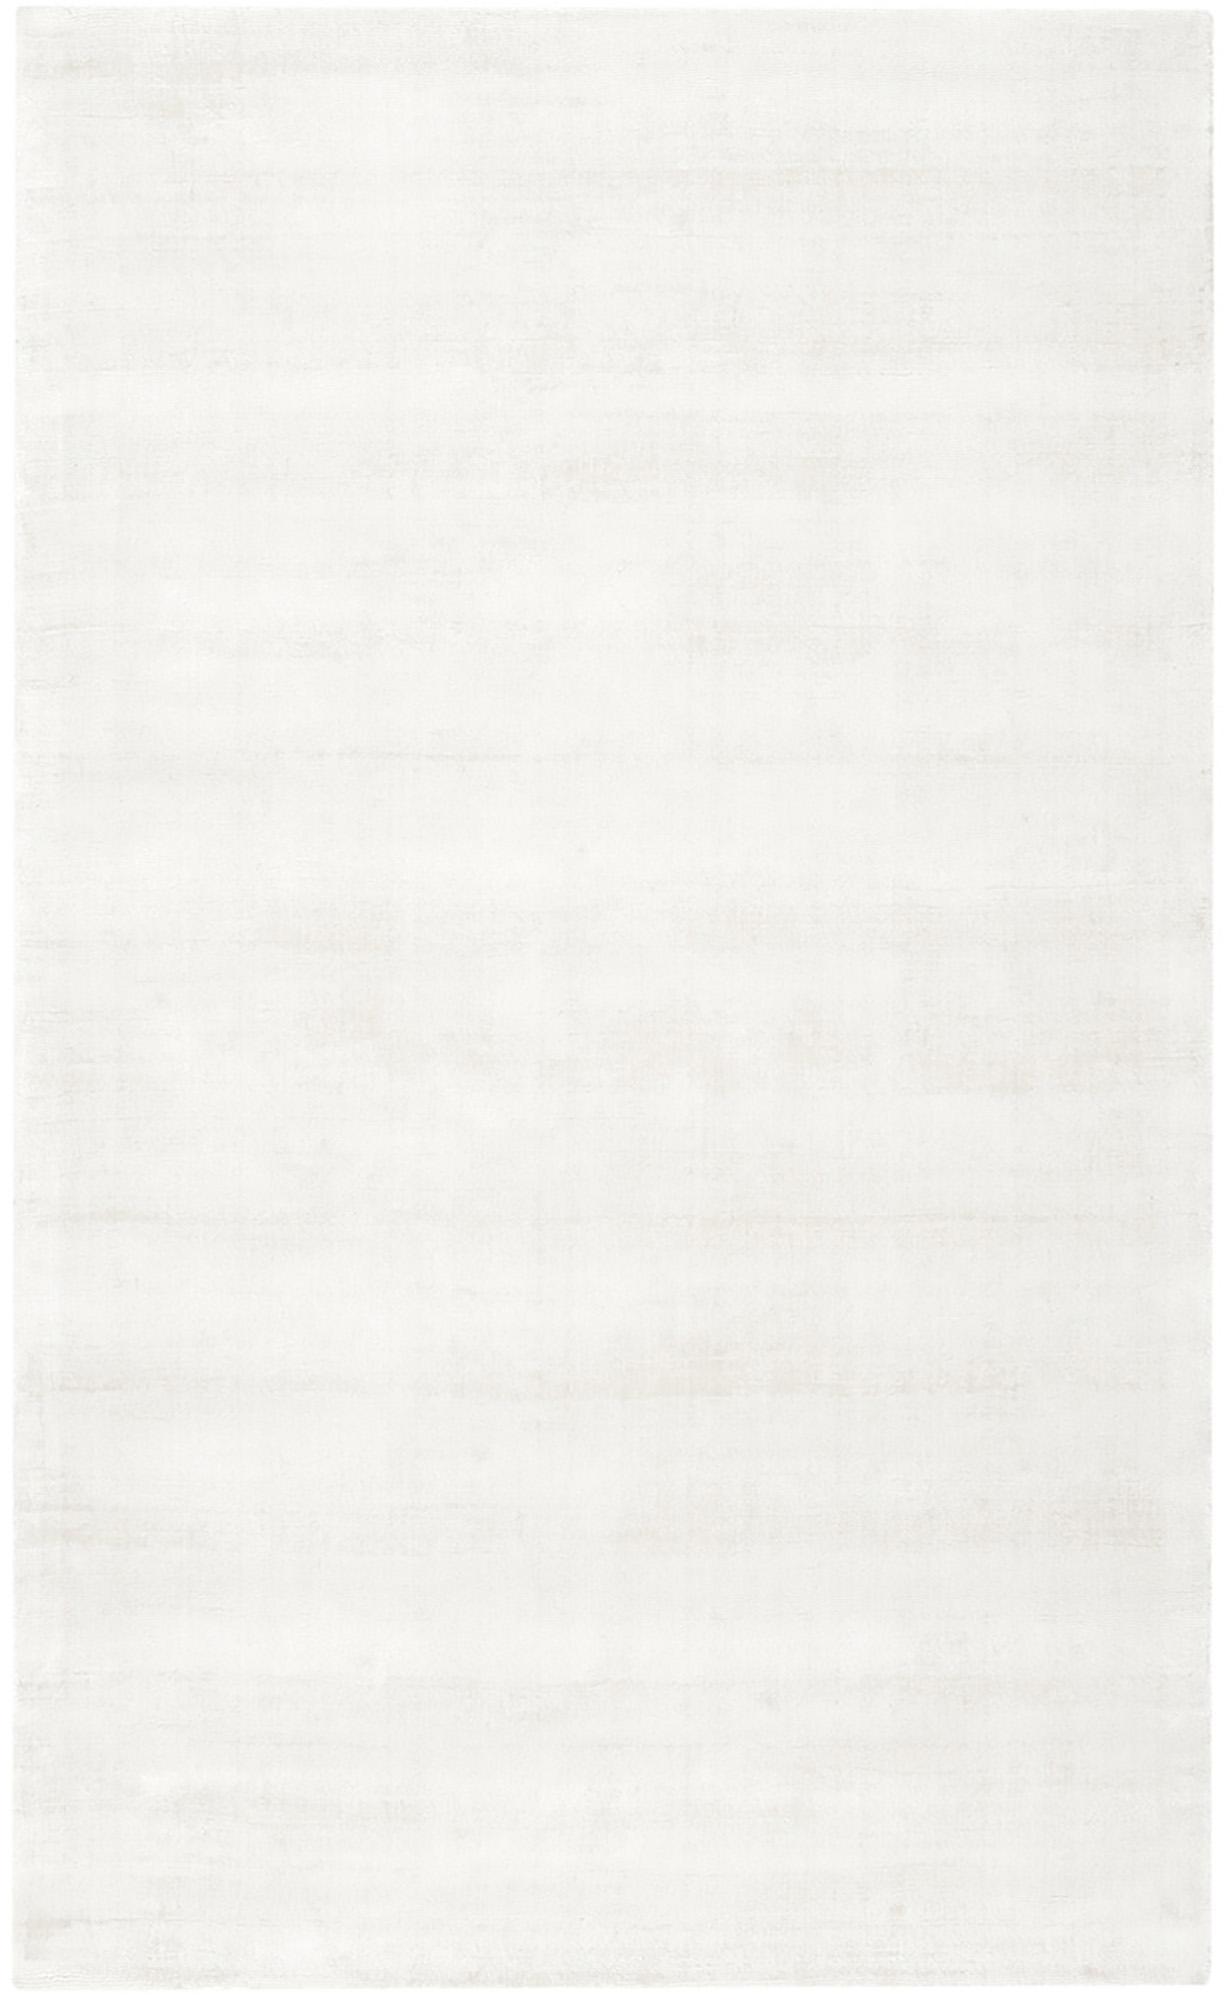 Handgewebter Viskoseteppich Jane in Elfenbeinfarben, Flor: 100% Viskose, Elfenbeinfarben, B 90 x L 150 cm (Größe XS)